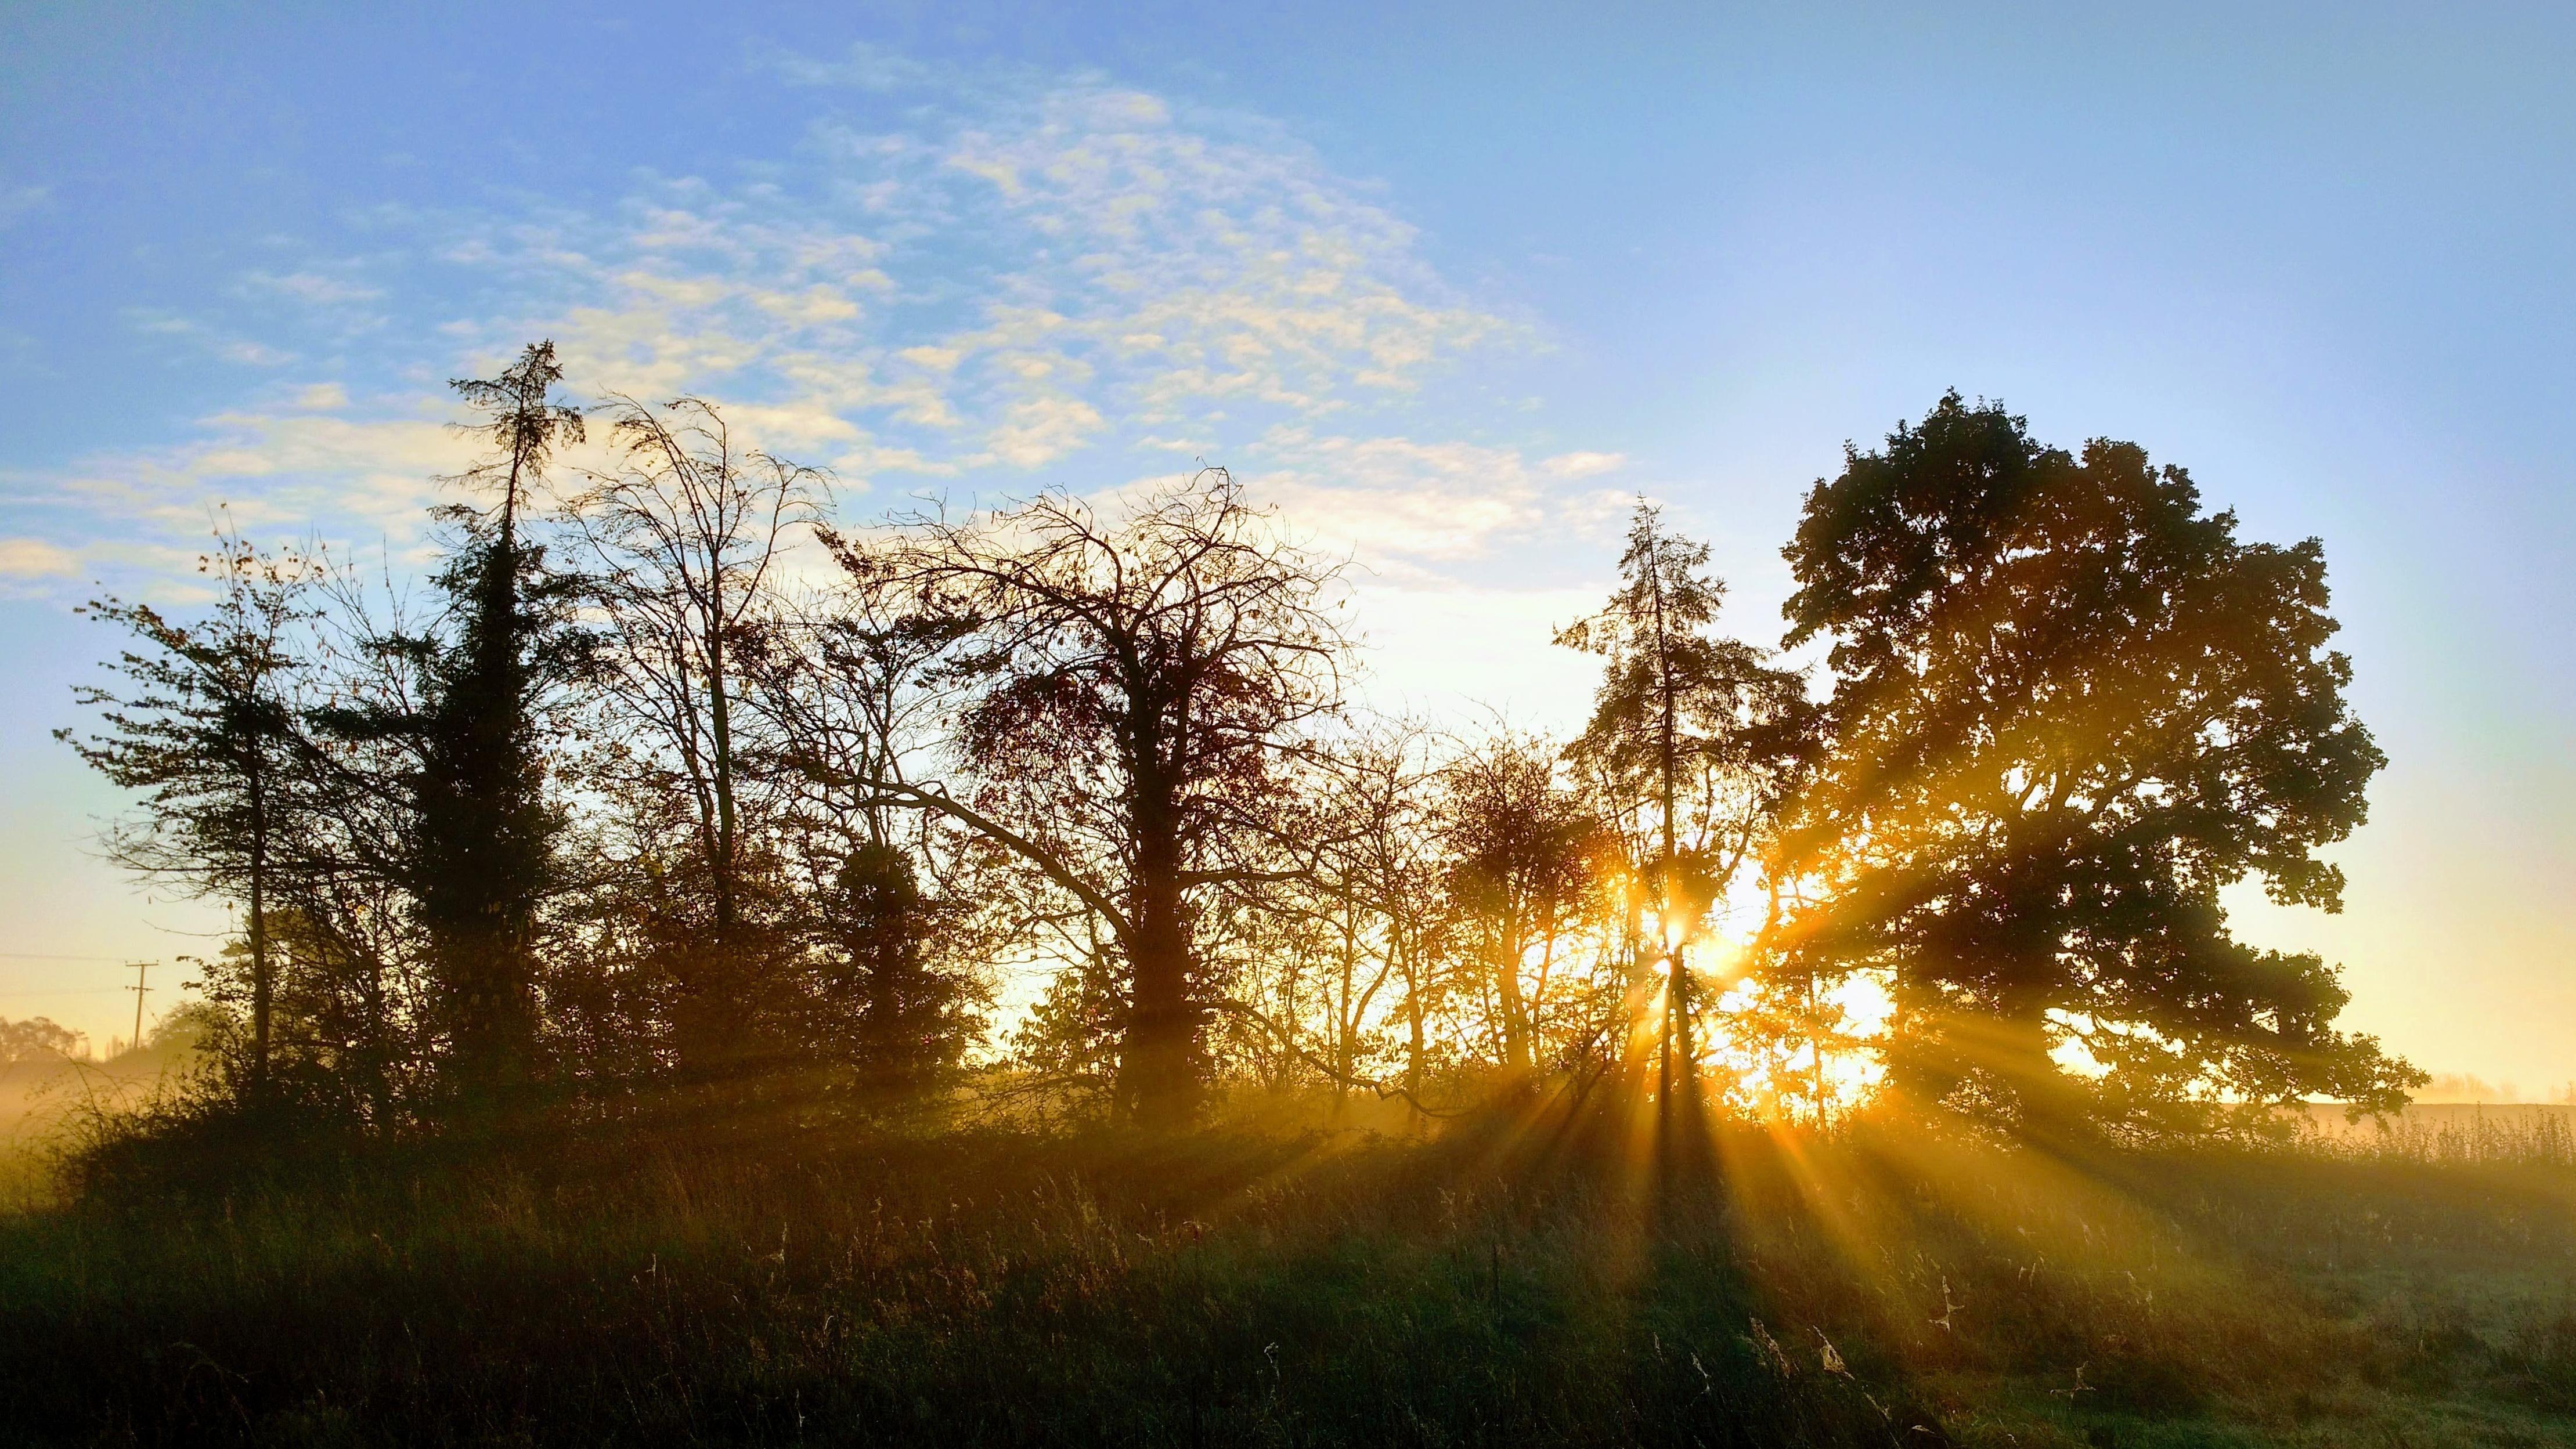 Autumn sunrise in hamptoninarden uk oc 4438x2497